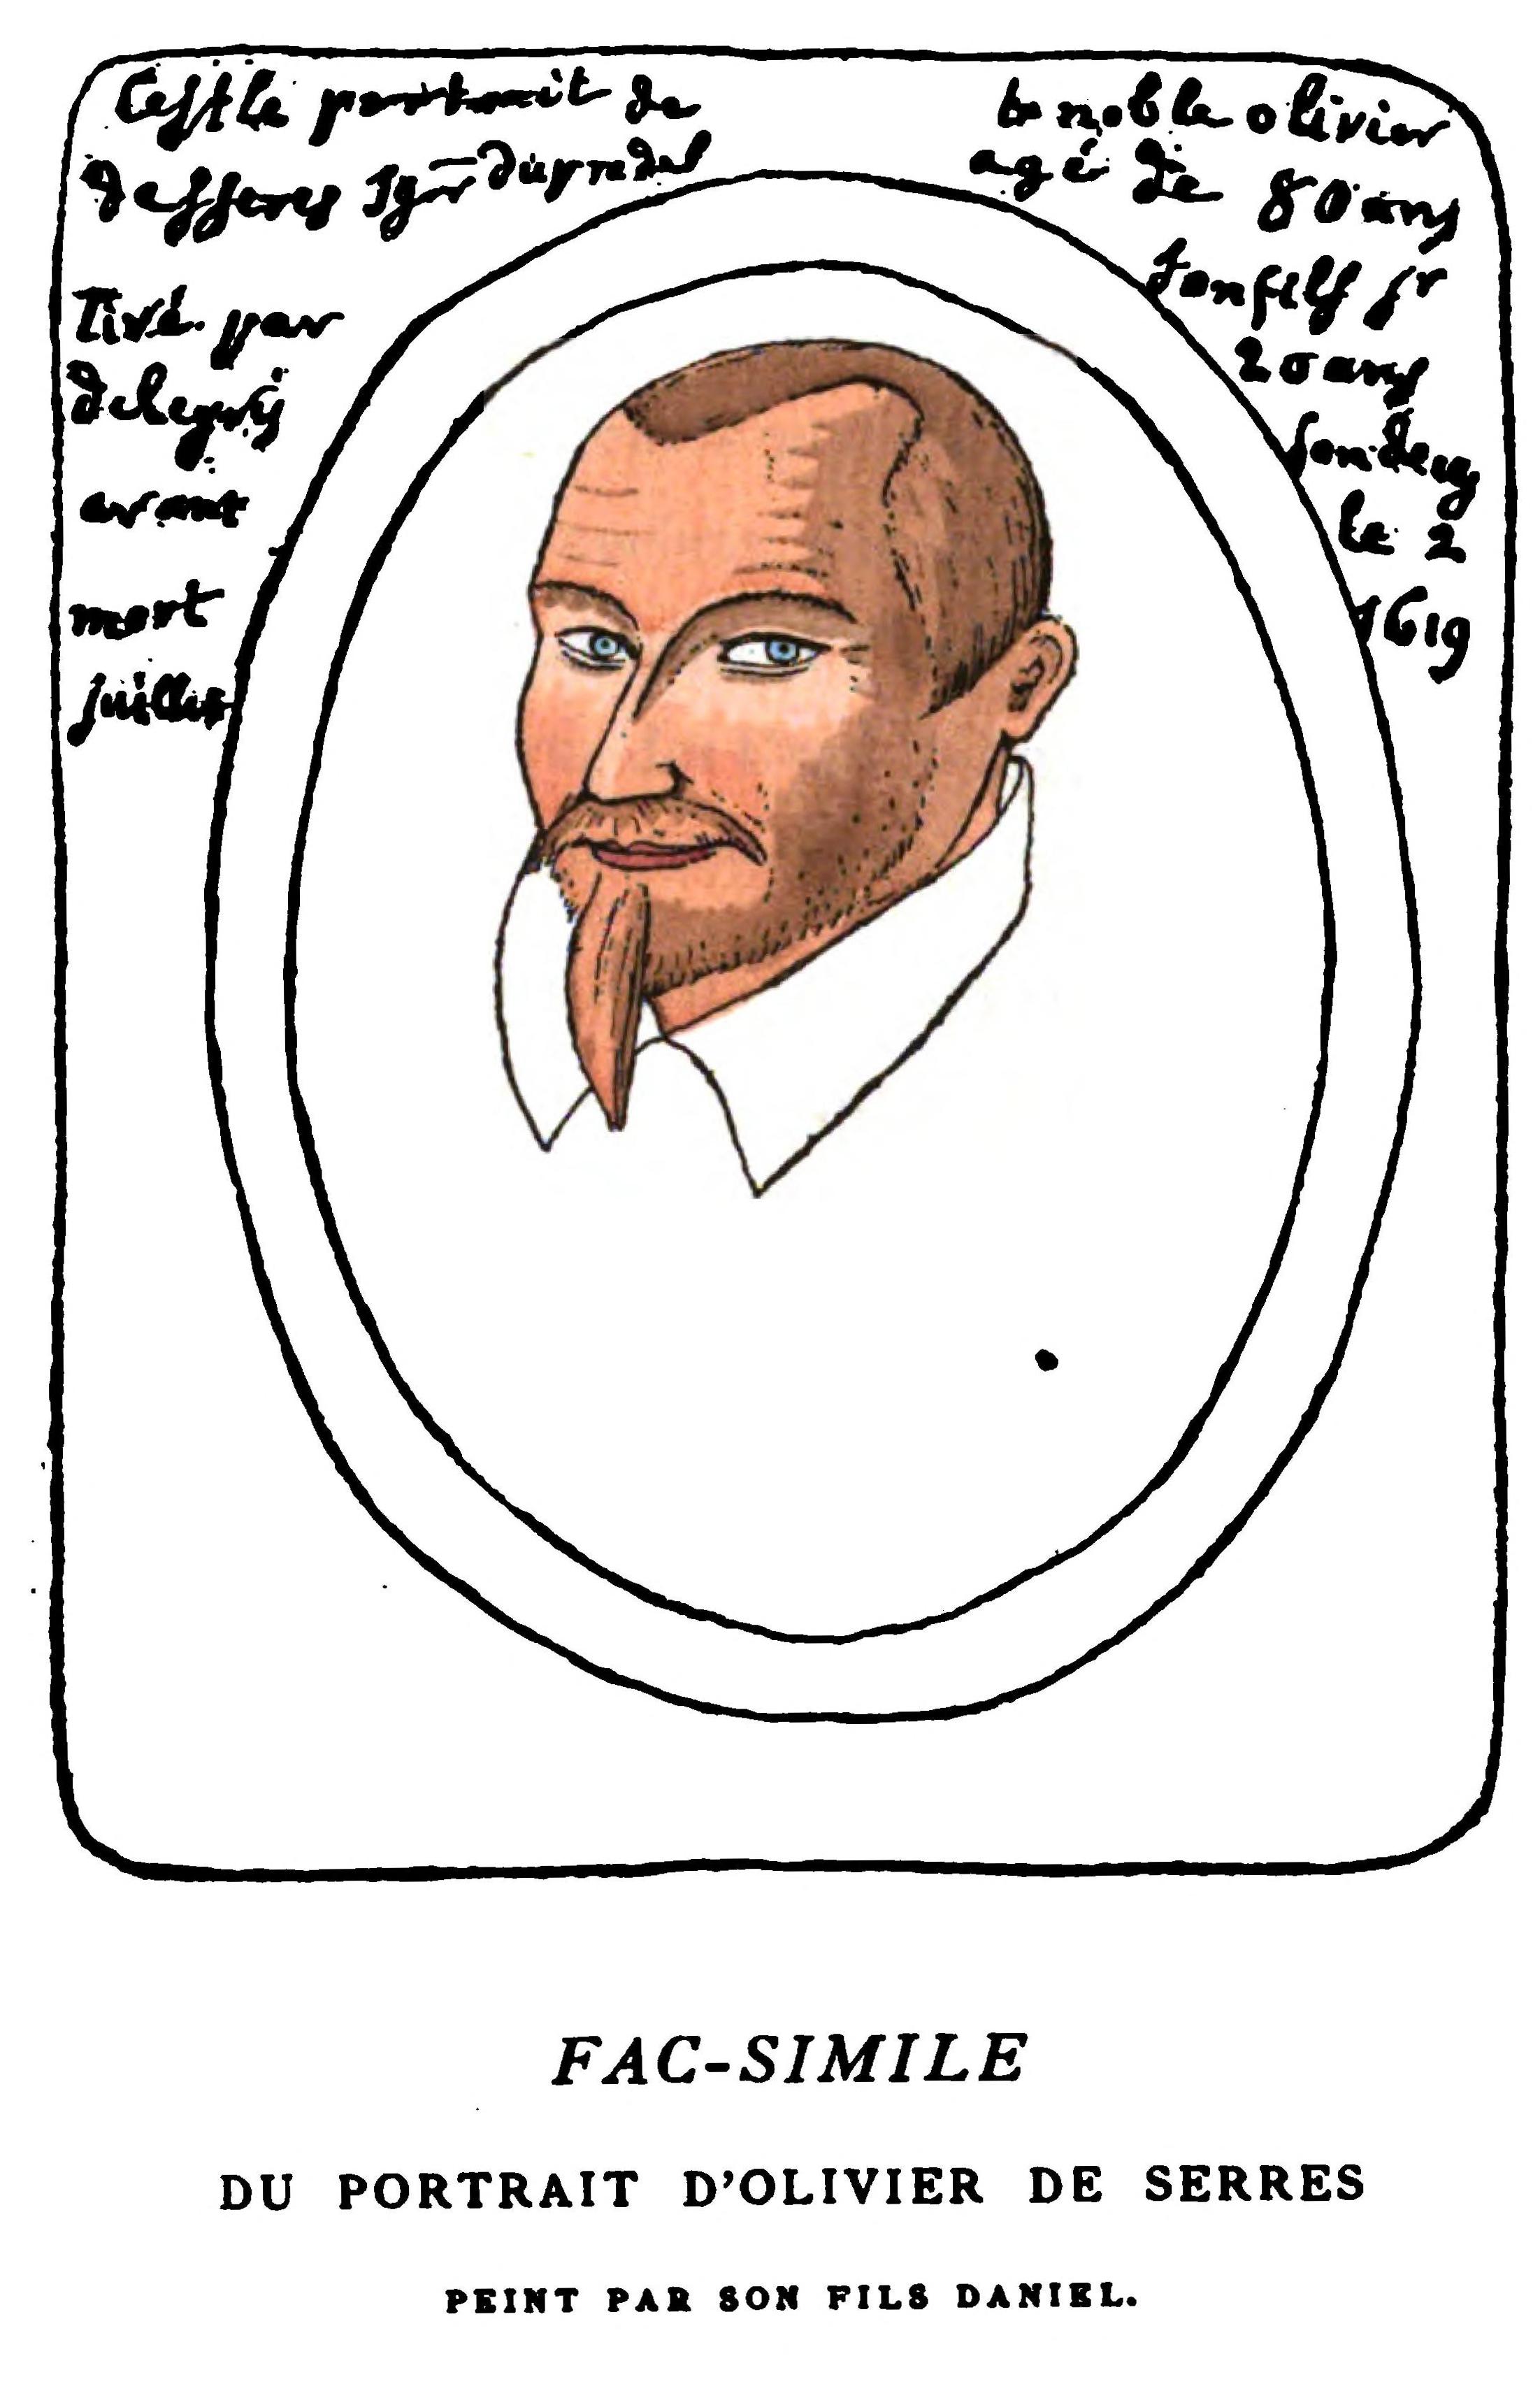 olivier de serres 1539 1619 portrait by his son daniel. Black Bedroom Furniture Sets. Home Design Ideas